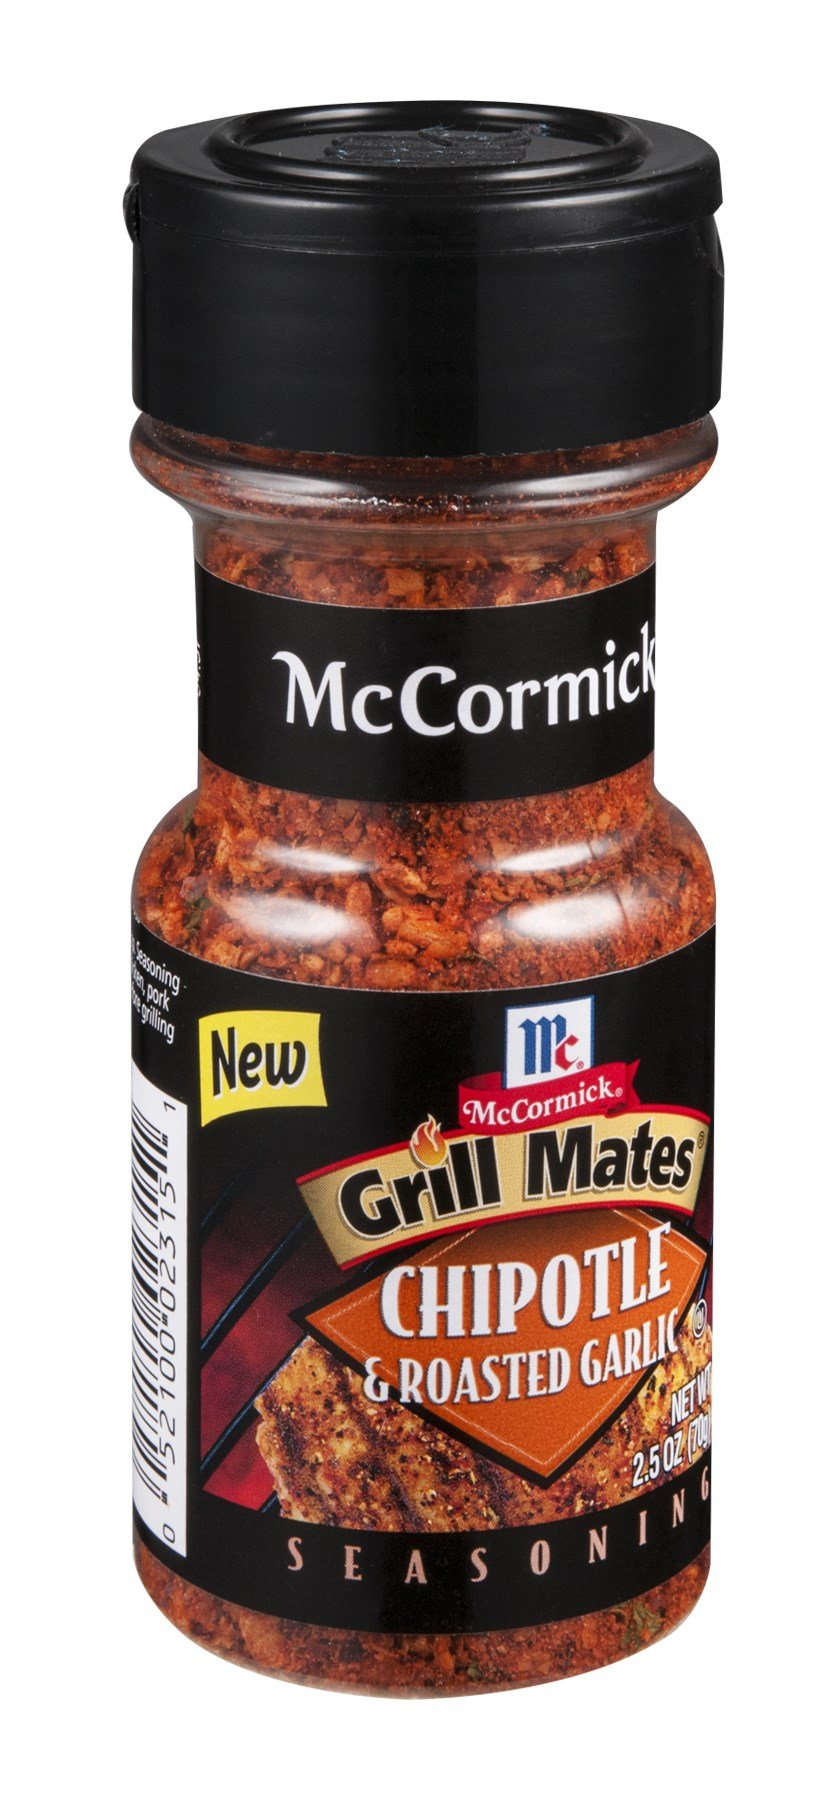 McCormick Grill Mates Chipotle & Roasted Garlic Seasoning, 2.5 OZ (Pack - 18)